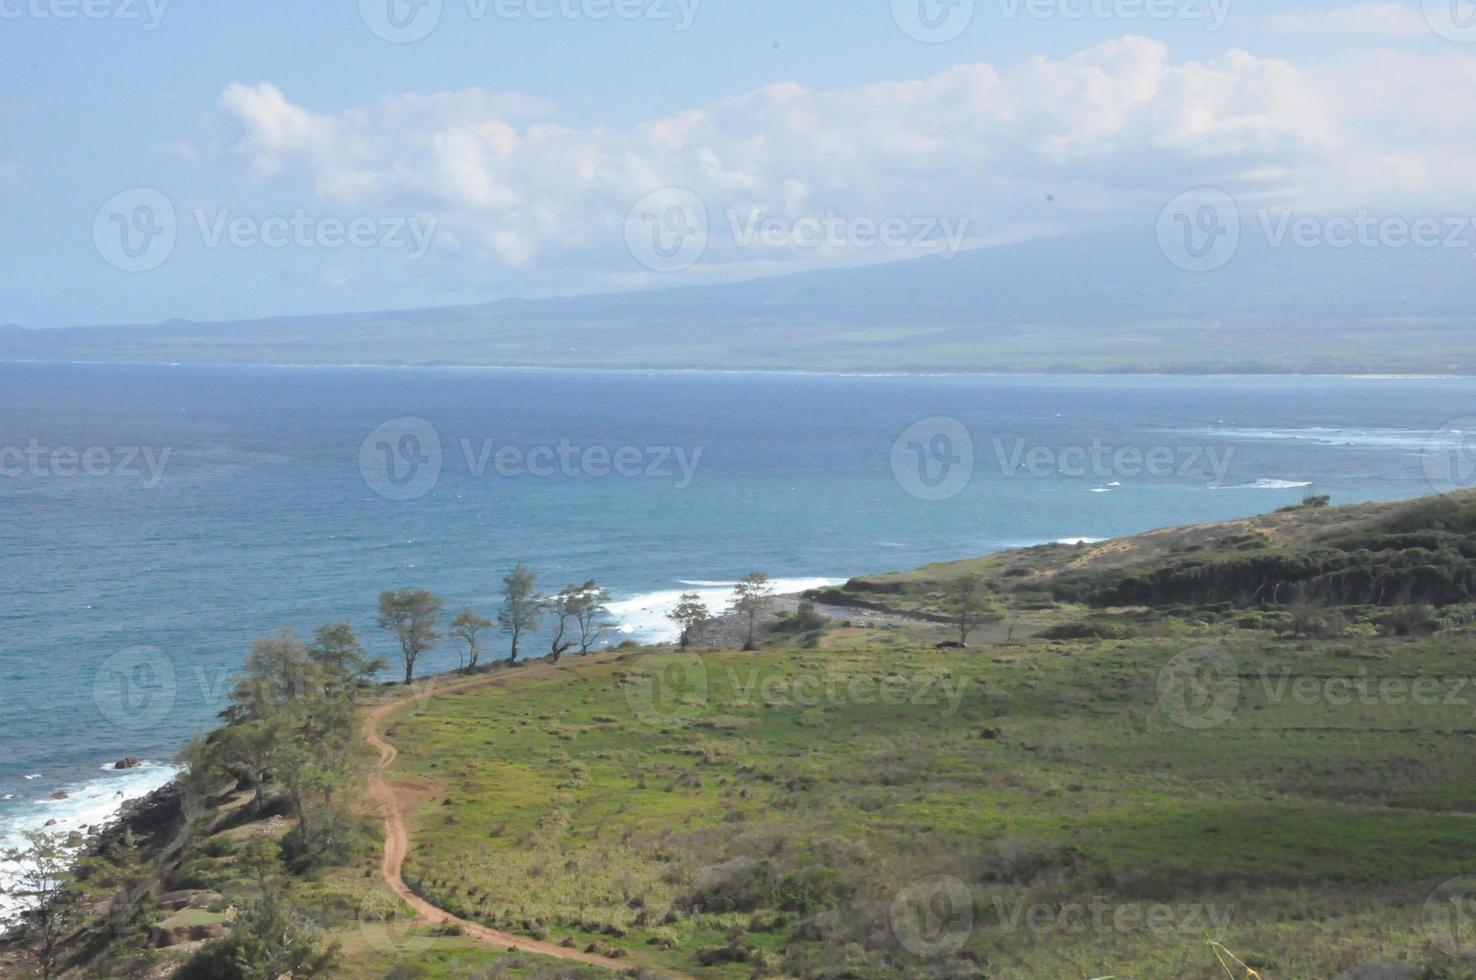 vista da estrada kahekili em maui, havaí foto